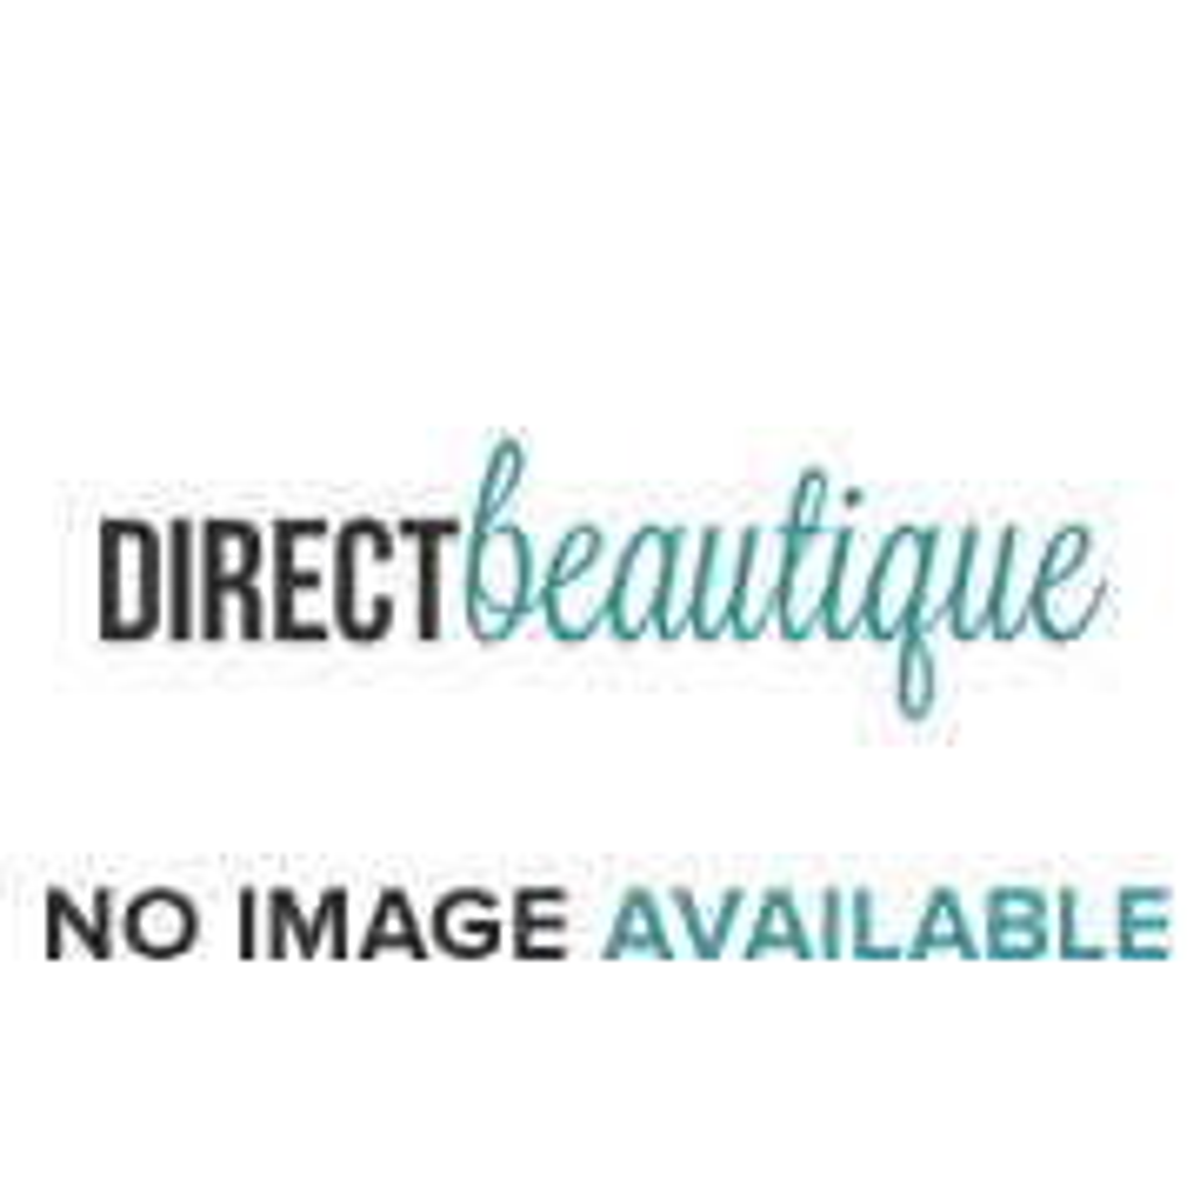 Moschino for Women 75ml EDT Spray